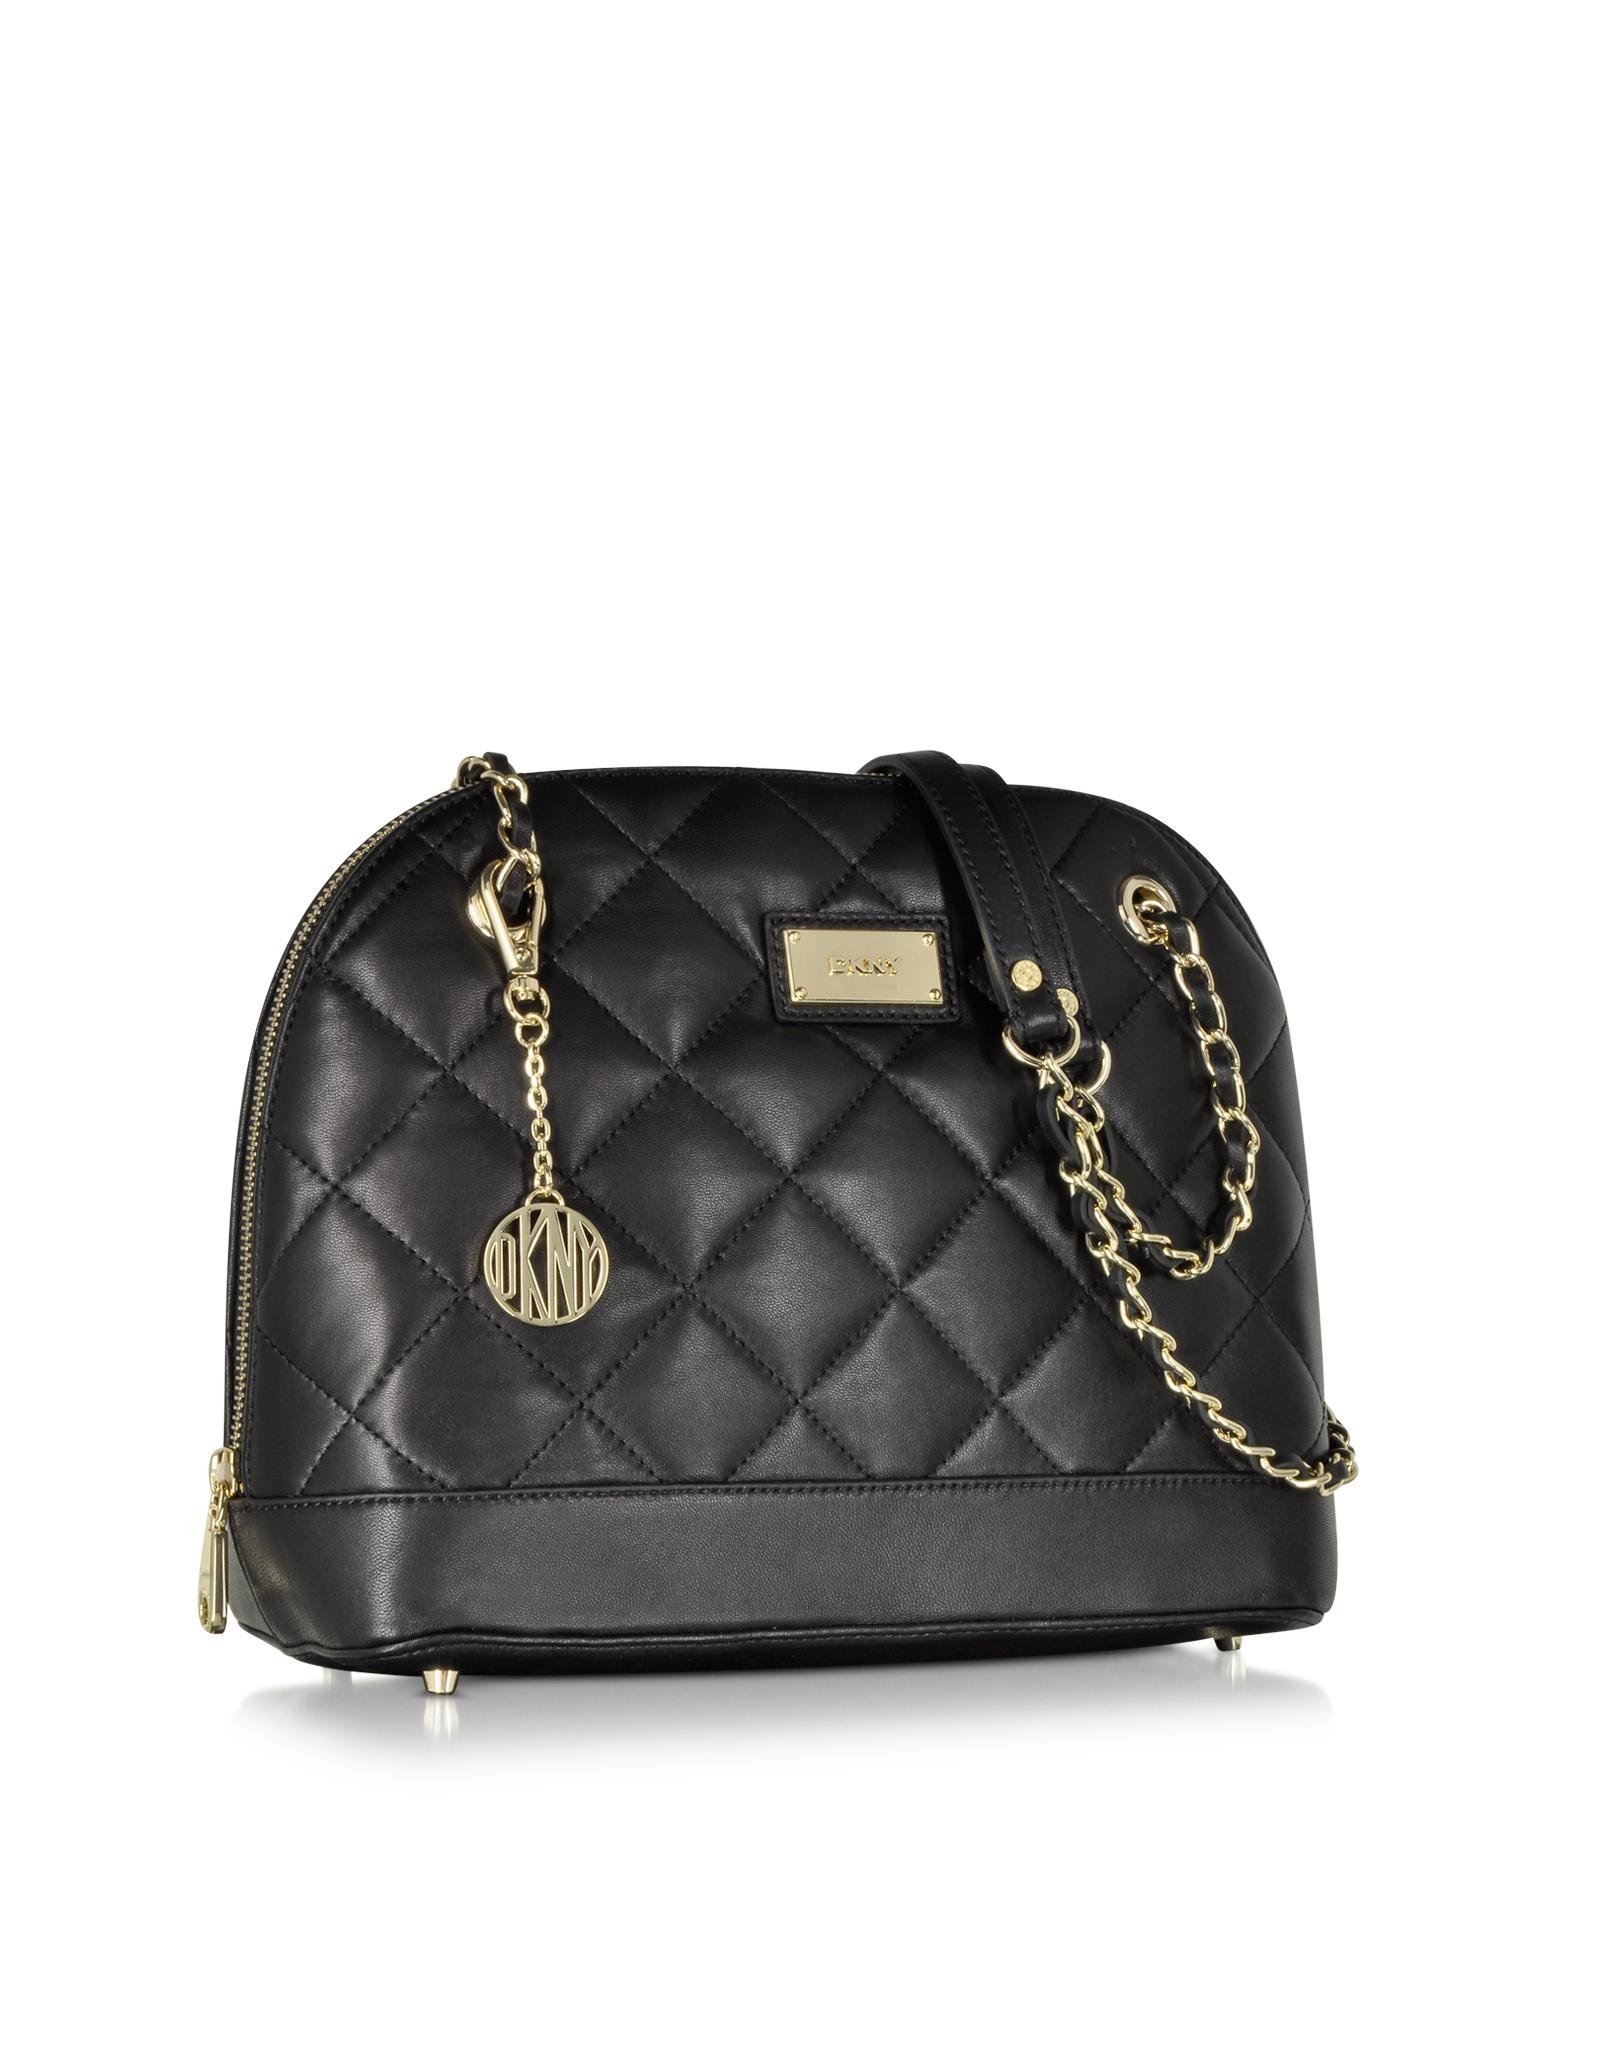 Lyst - Dkny Gansevoort Black Quilted Nappa Satchel Bag in Black : dkny black quilted purse - Adamdwight.com